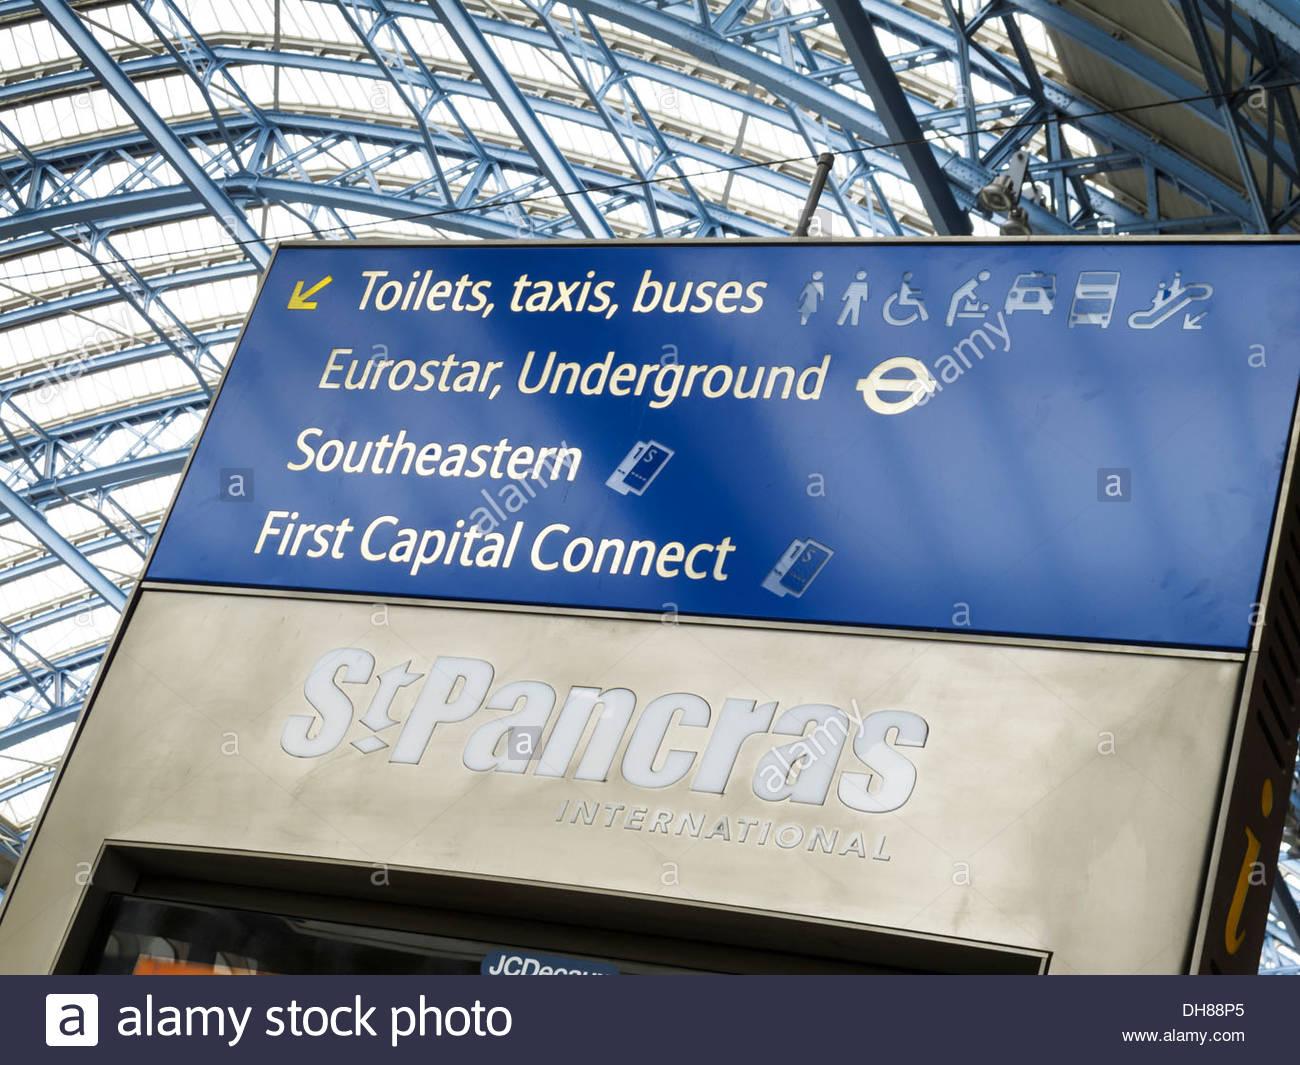 St Pancras International Railway Station London England - Stock Image